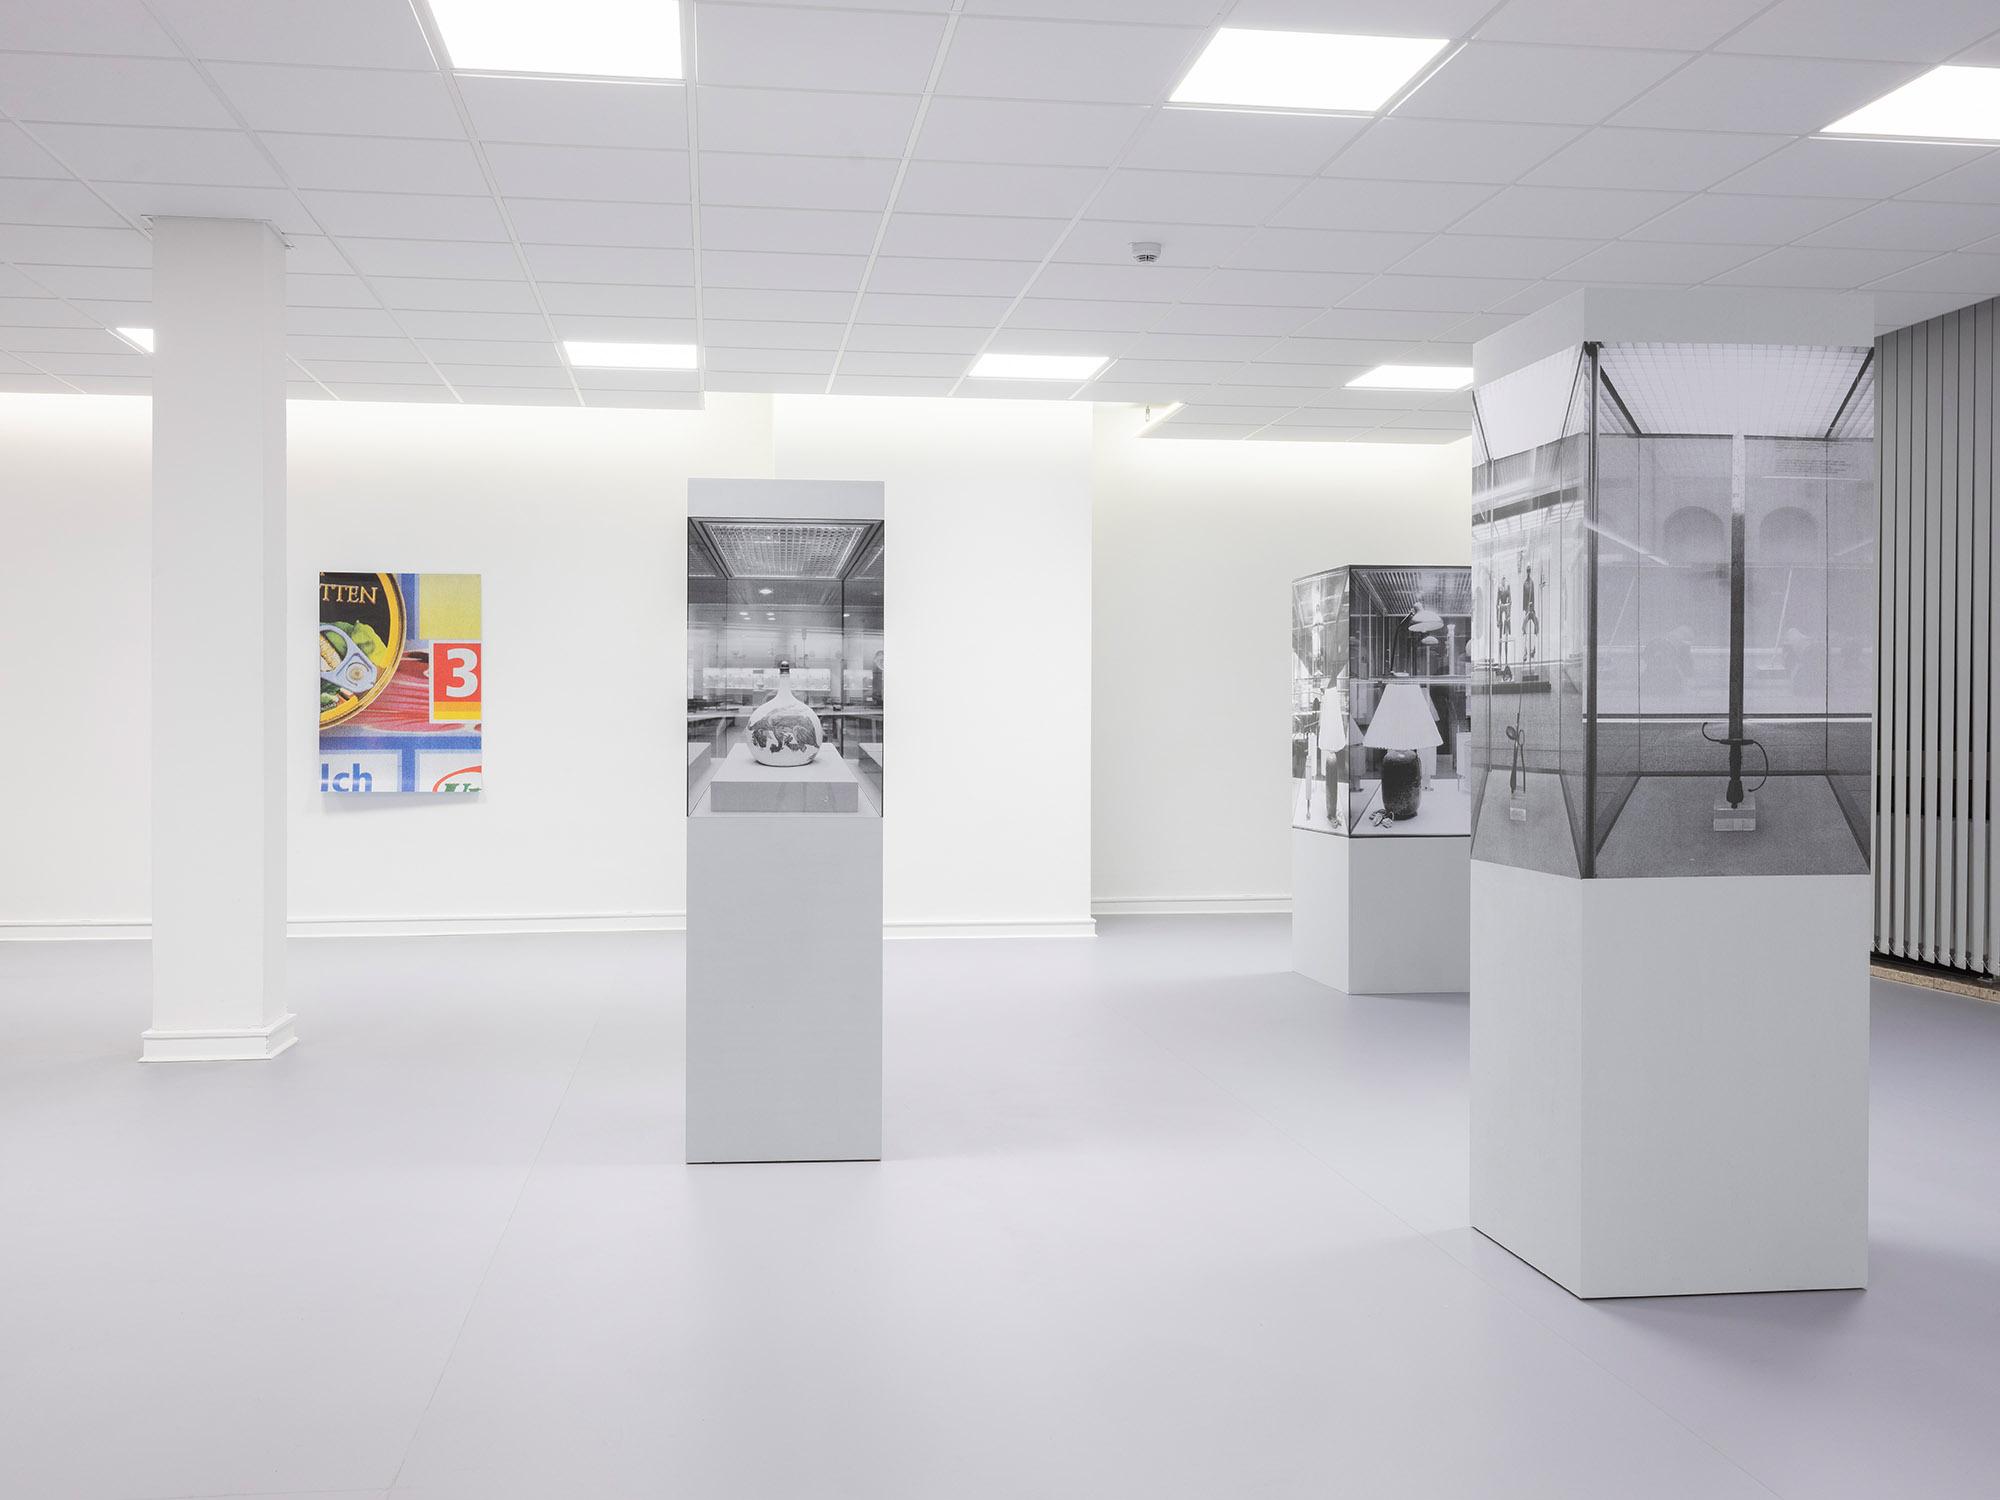 discover, immerse, wall art, interior decor, decoration,